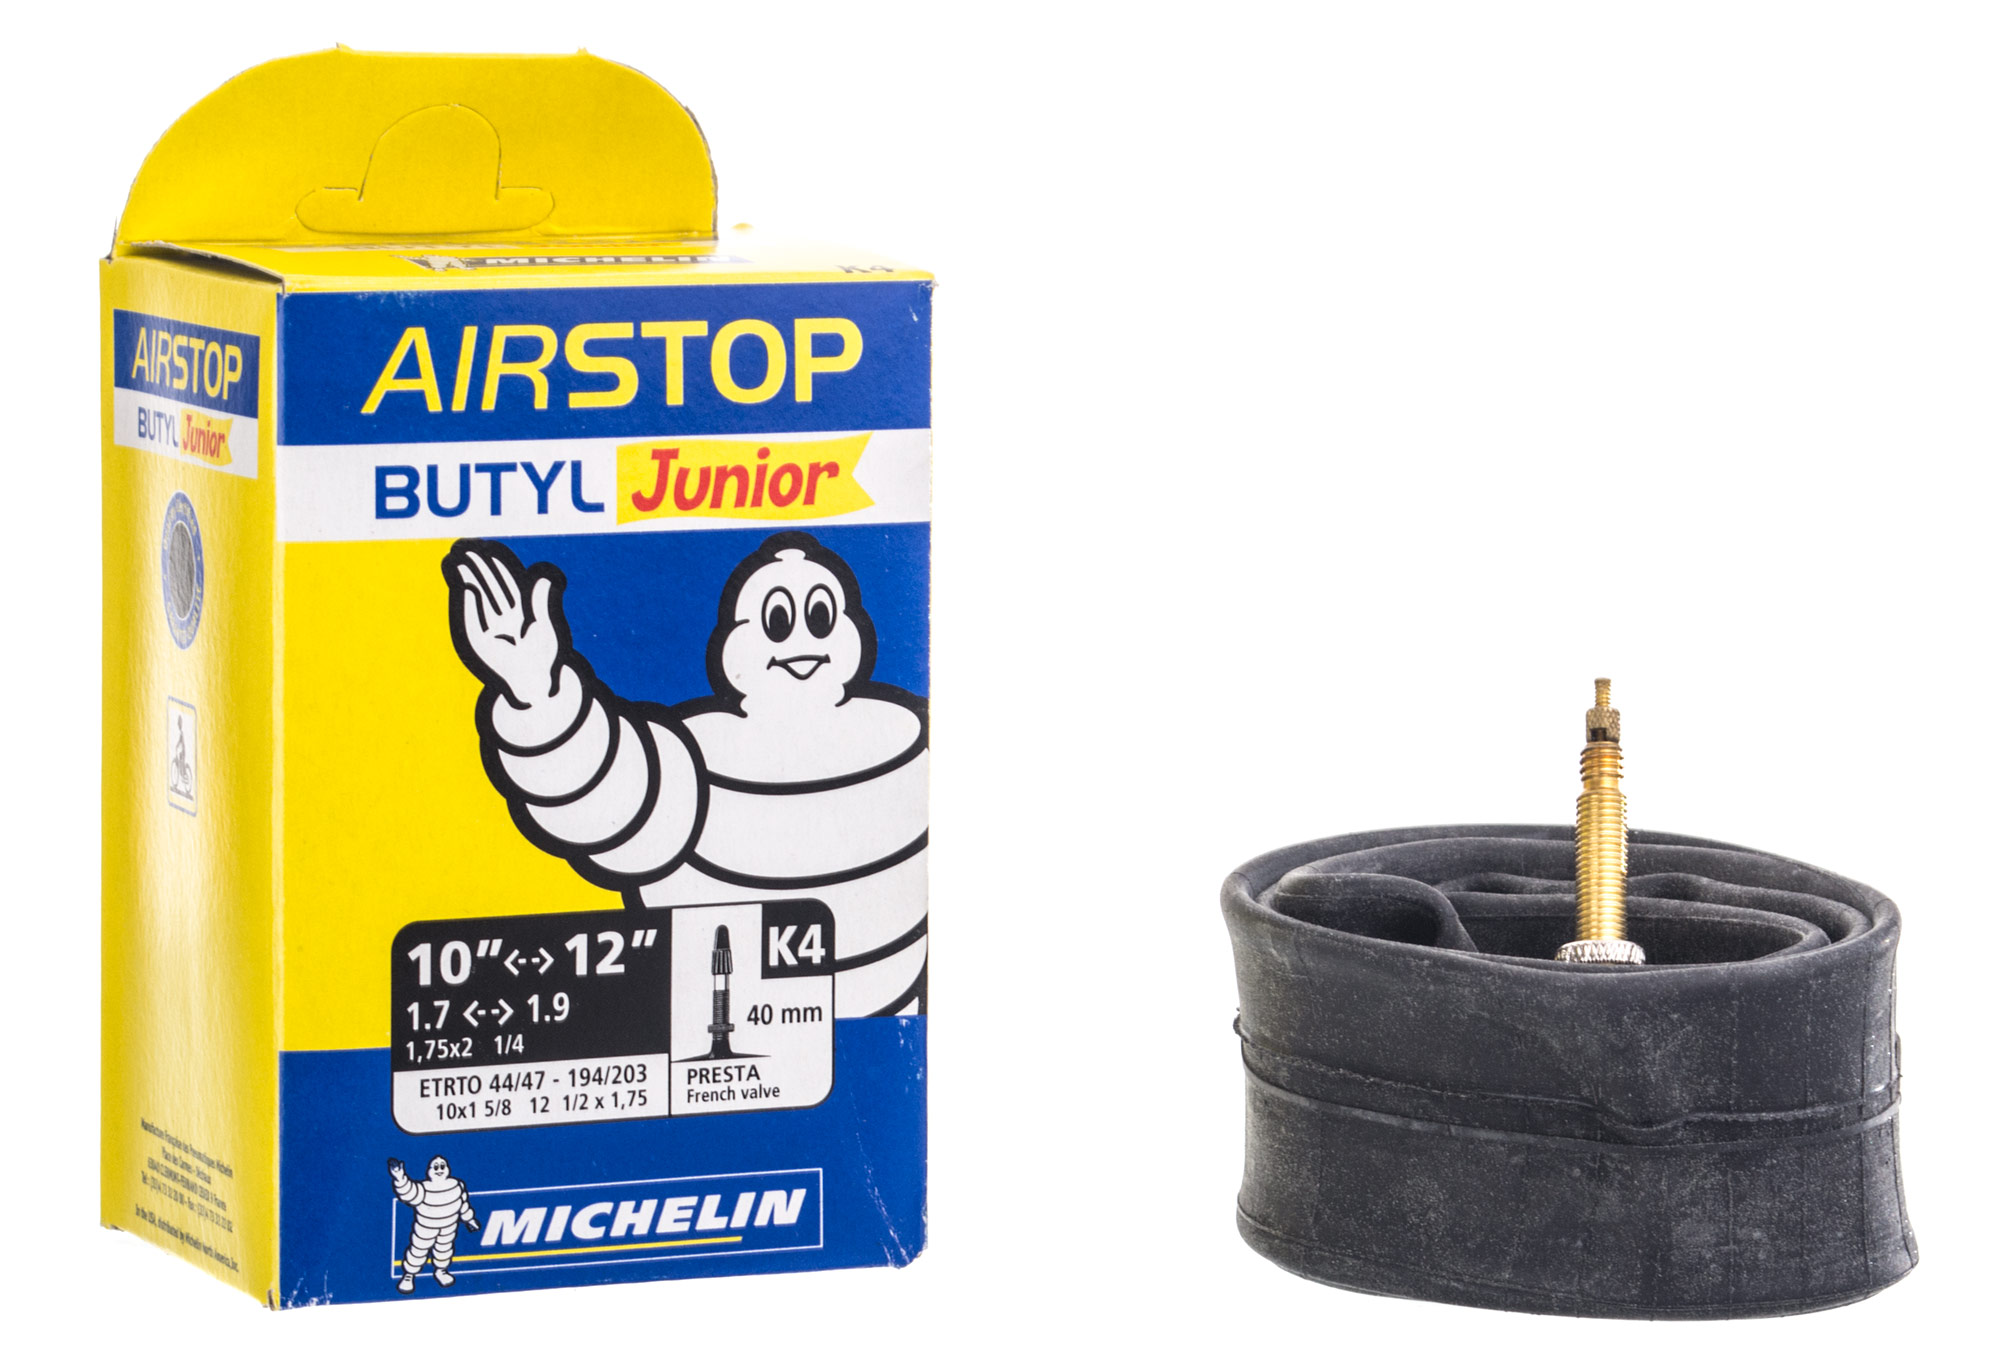 Michelin chambre air vtt k4 airstop 10 12 valve presta 40 mm - Chambre a air vtt increvable ...